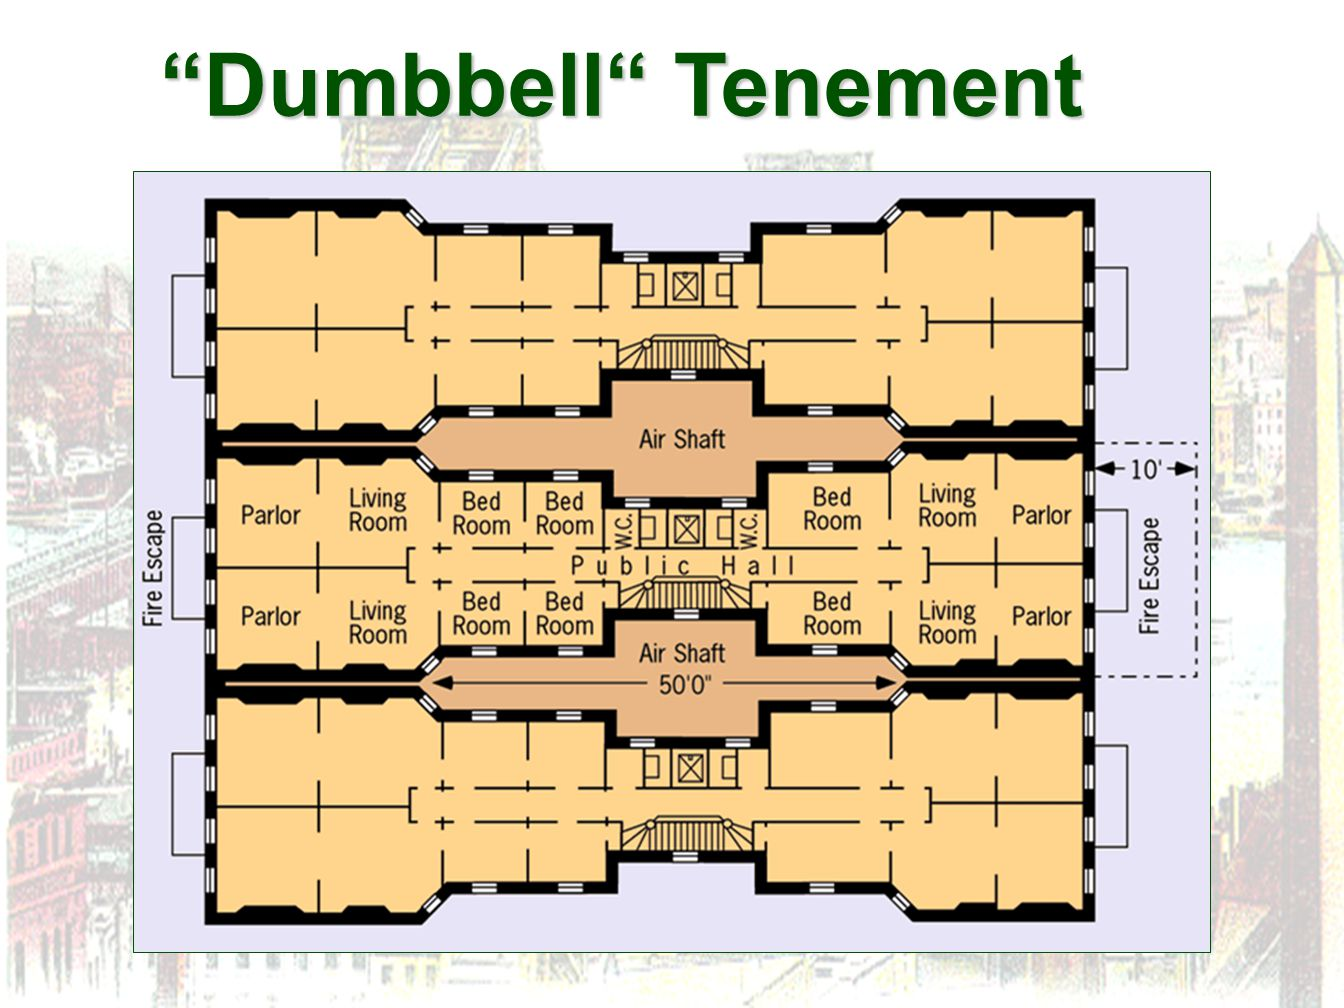 Dumbbell Tenement